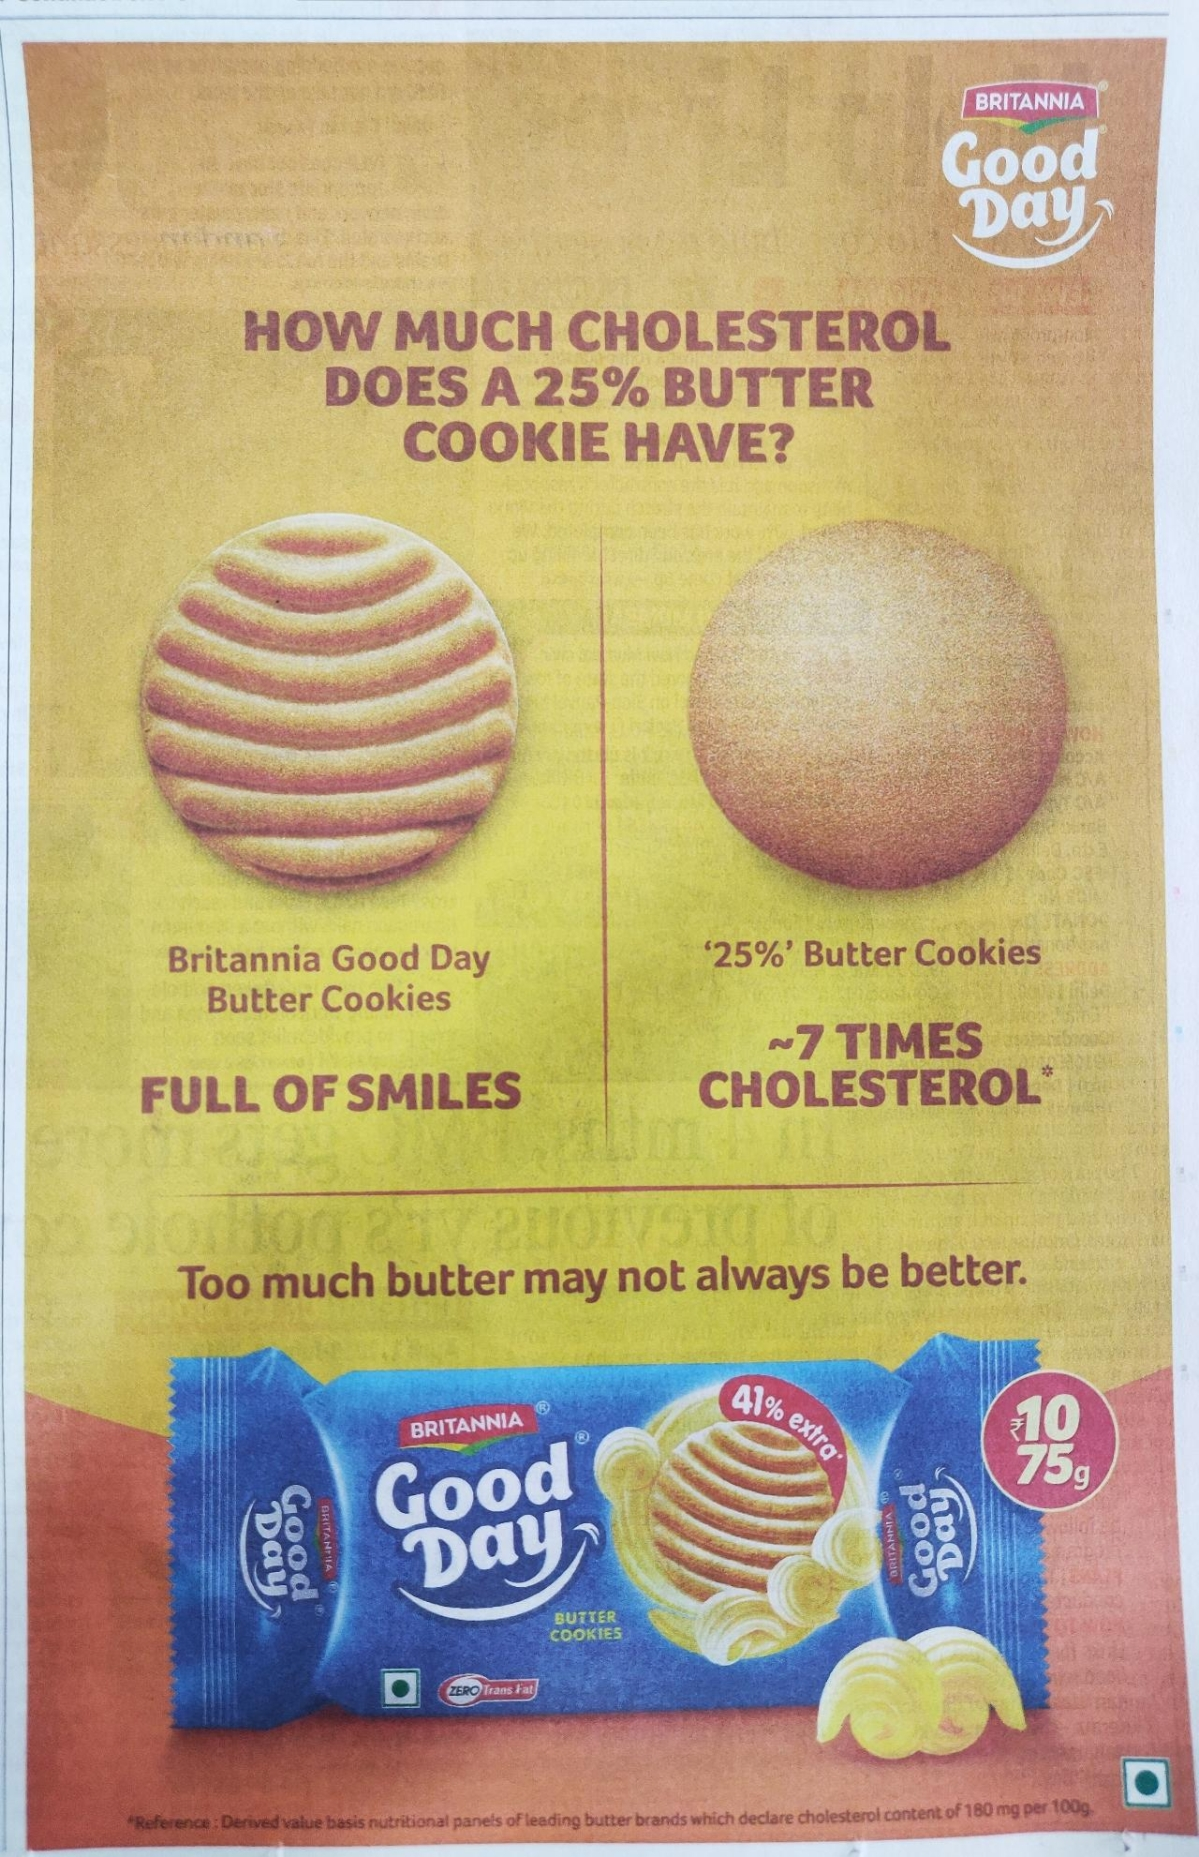 A recent Britannia ad